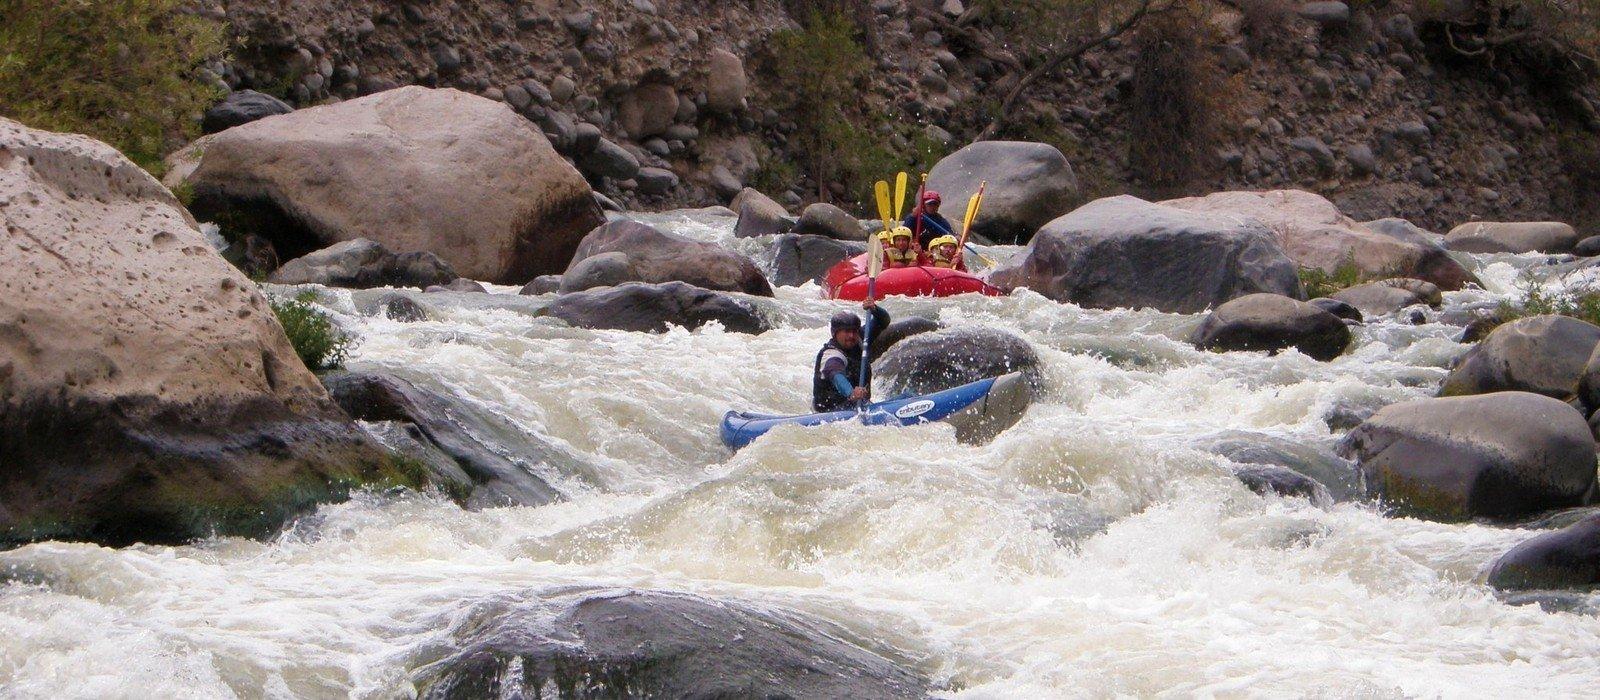 Rafting Chili River